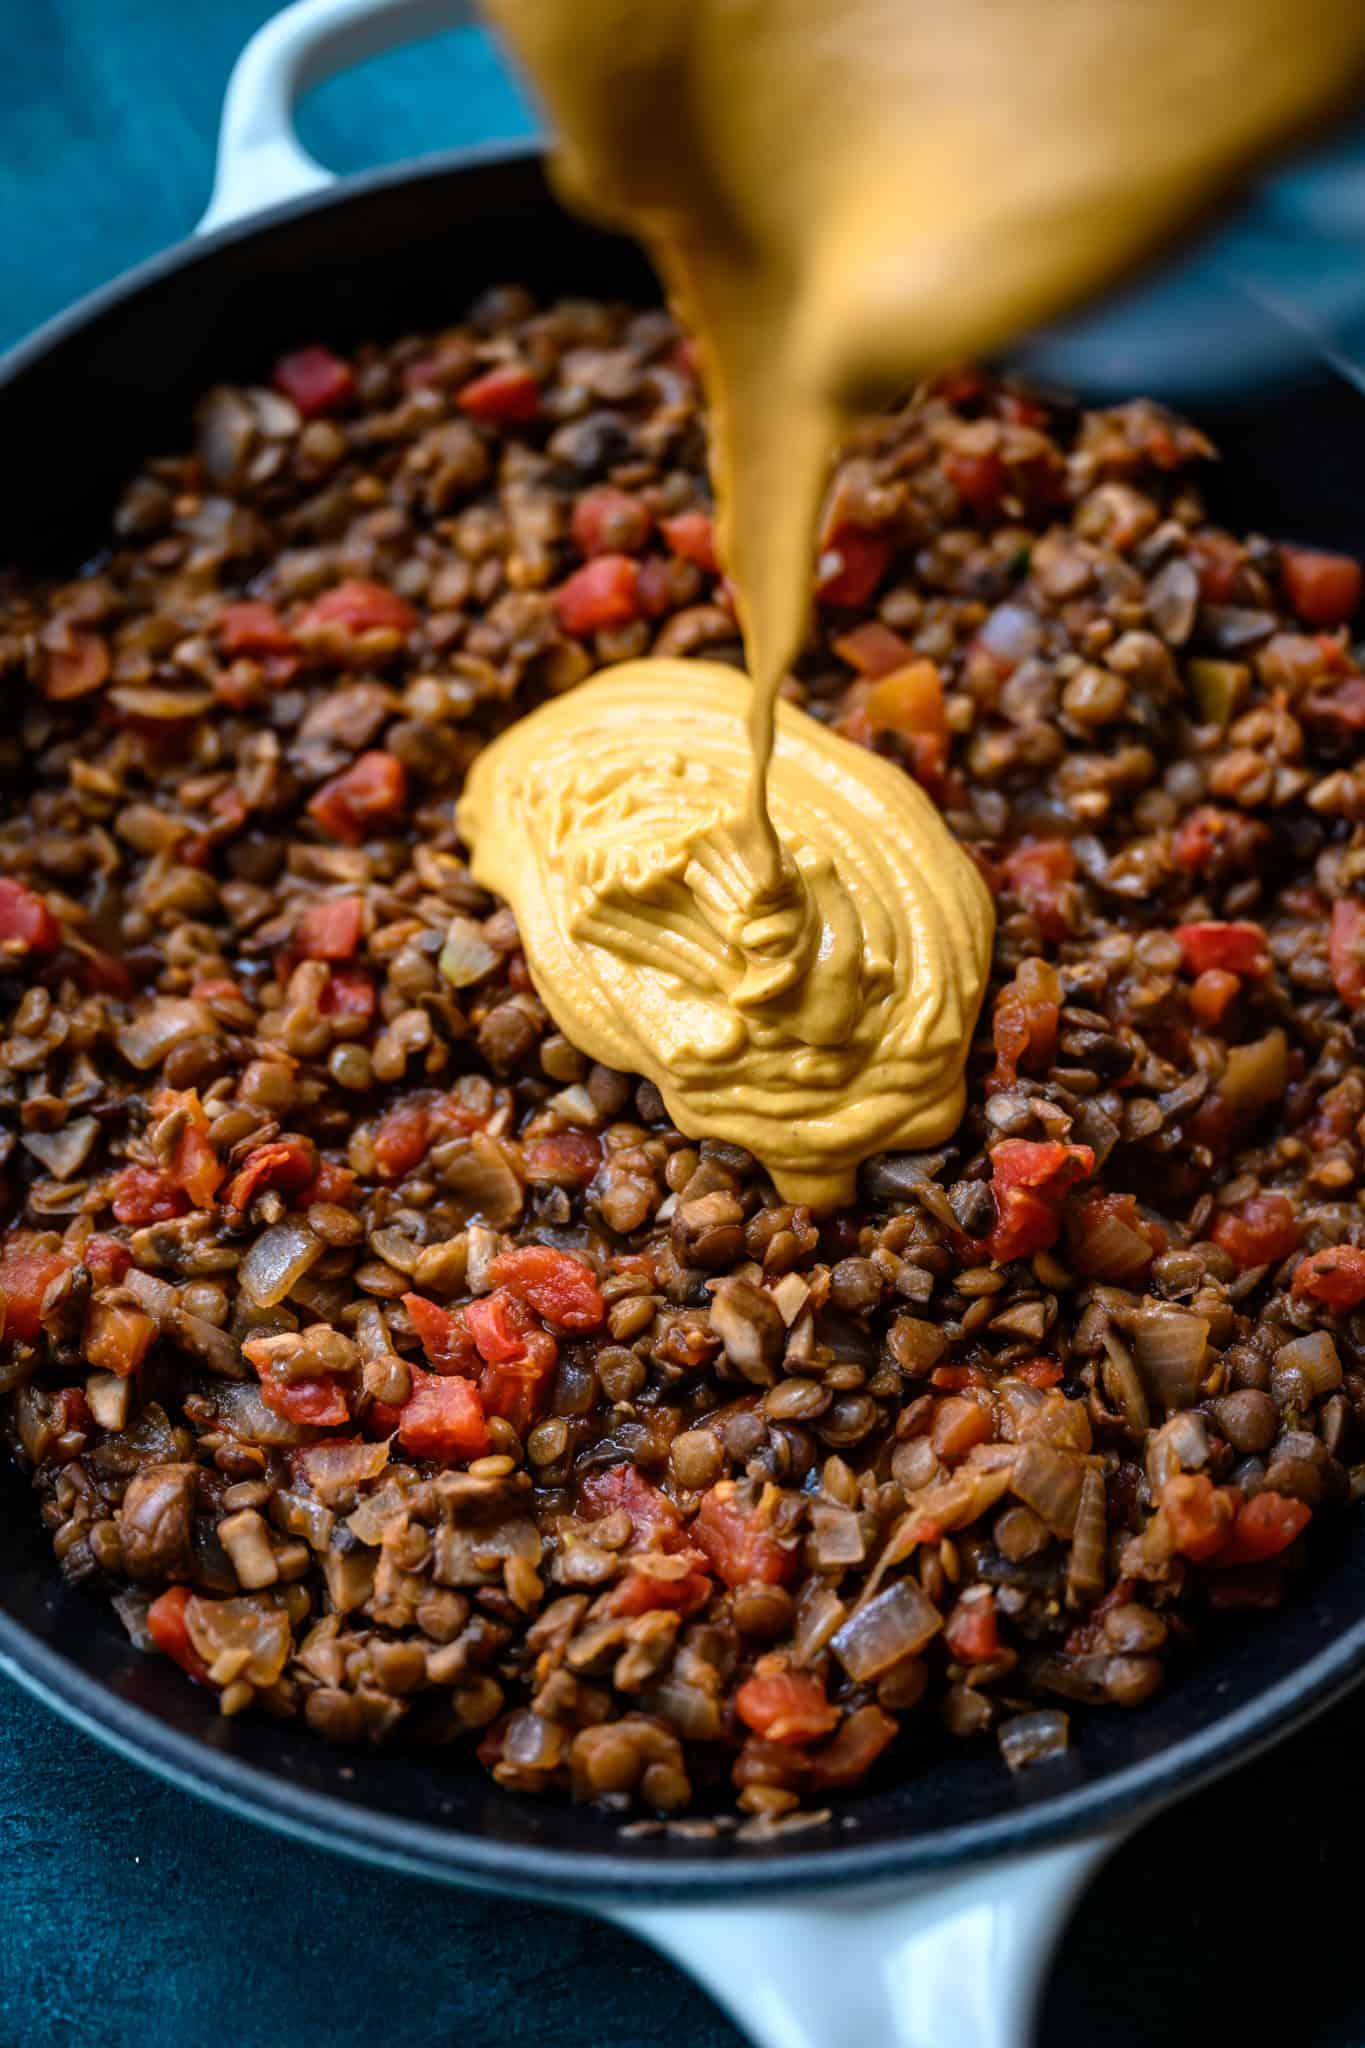 pouring vegan queso dip into vegan lentil mushroom mixture